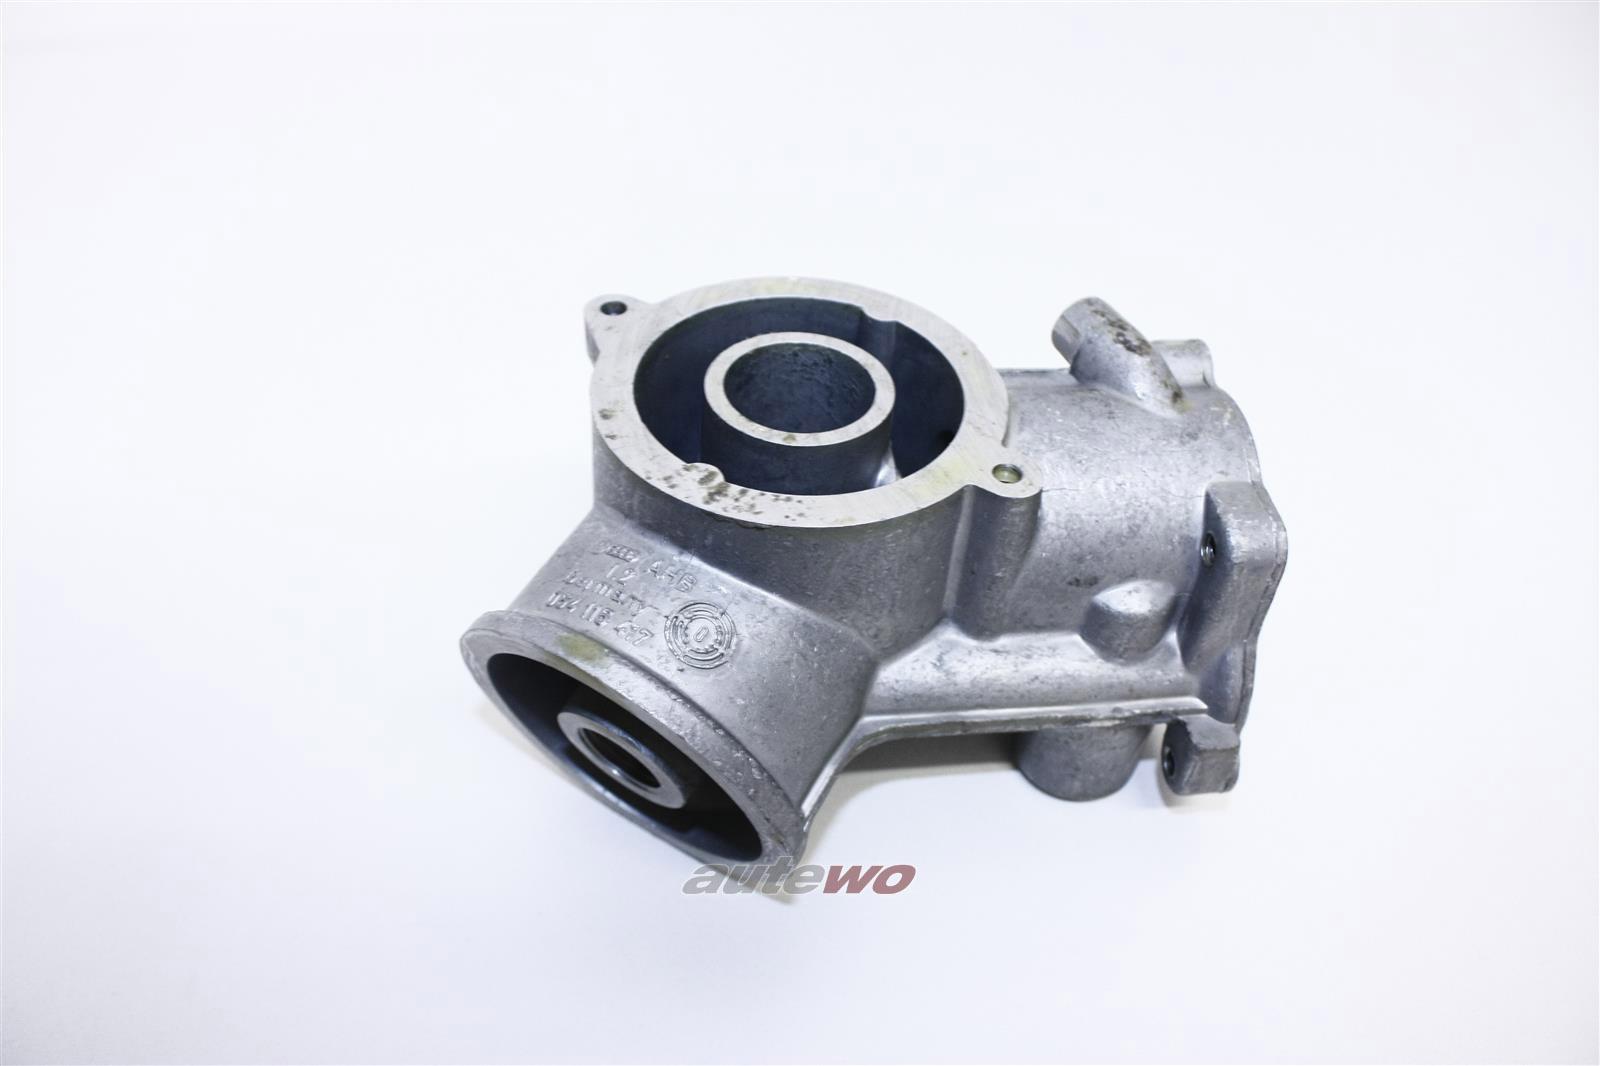 034115417 NEU Audi 100/200 Typ 44/Urquattro/S2 10V/20V Turbo Ölfilterhalter